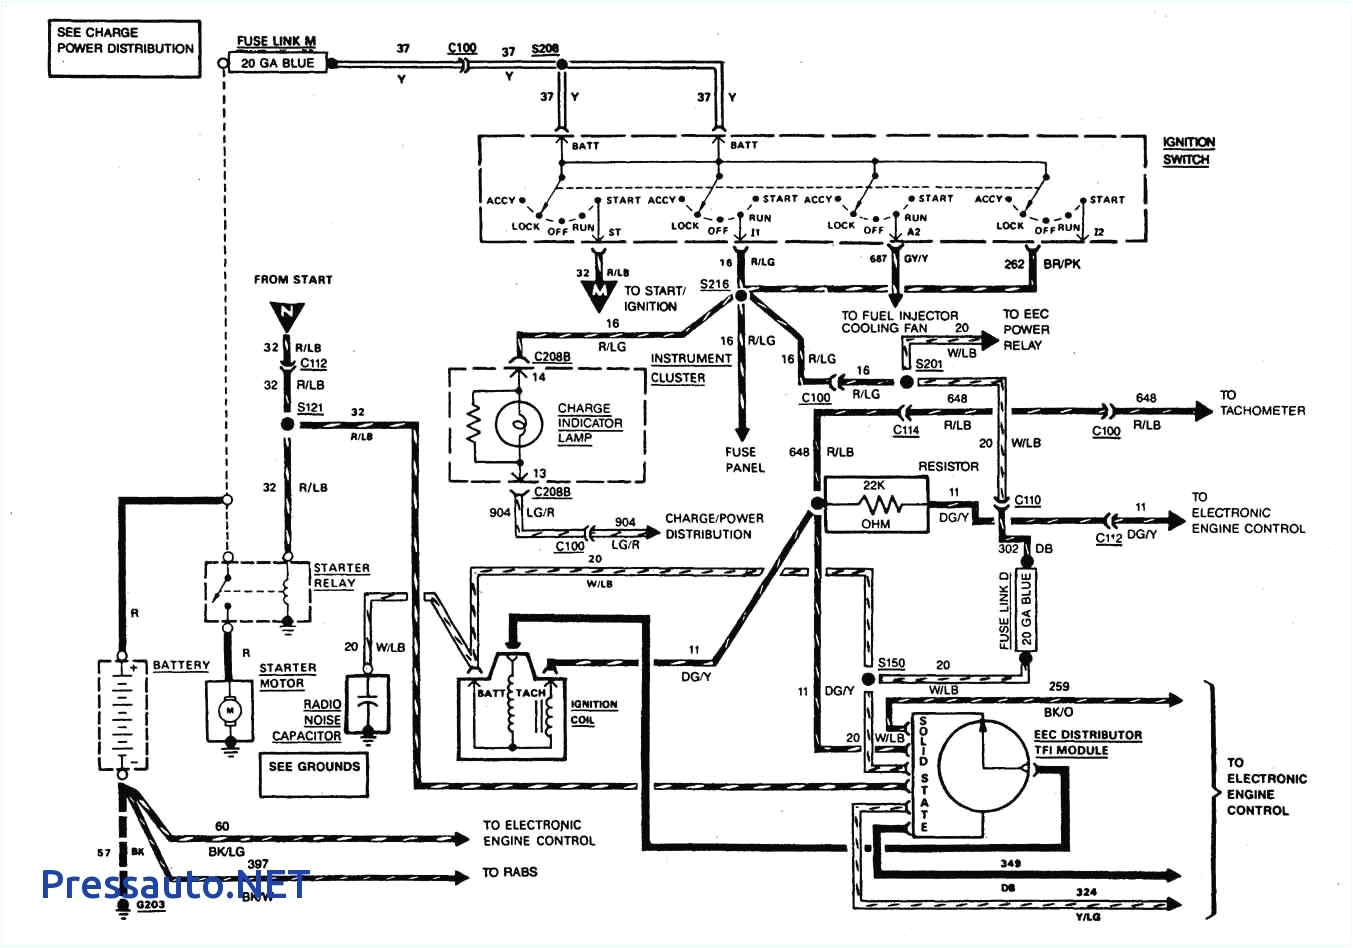 ford wiring diagrams f150 wiring diagram inside86 ford f 150 ignition switch wiring wiring diagram toolbox